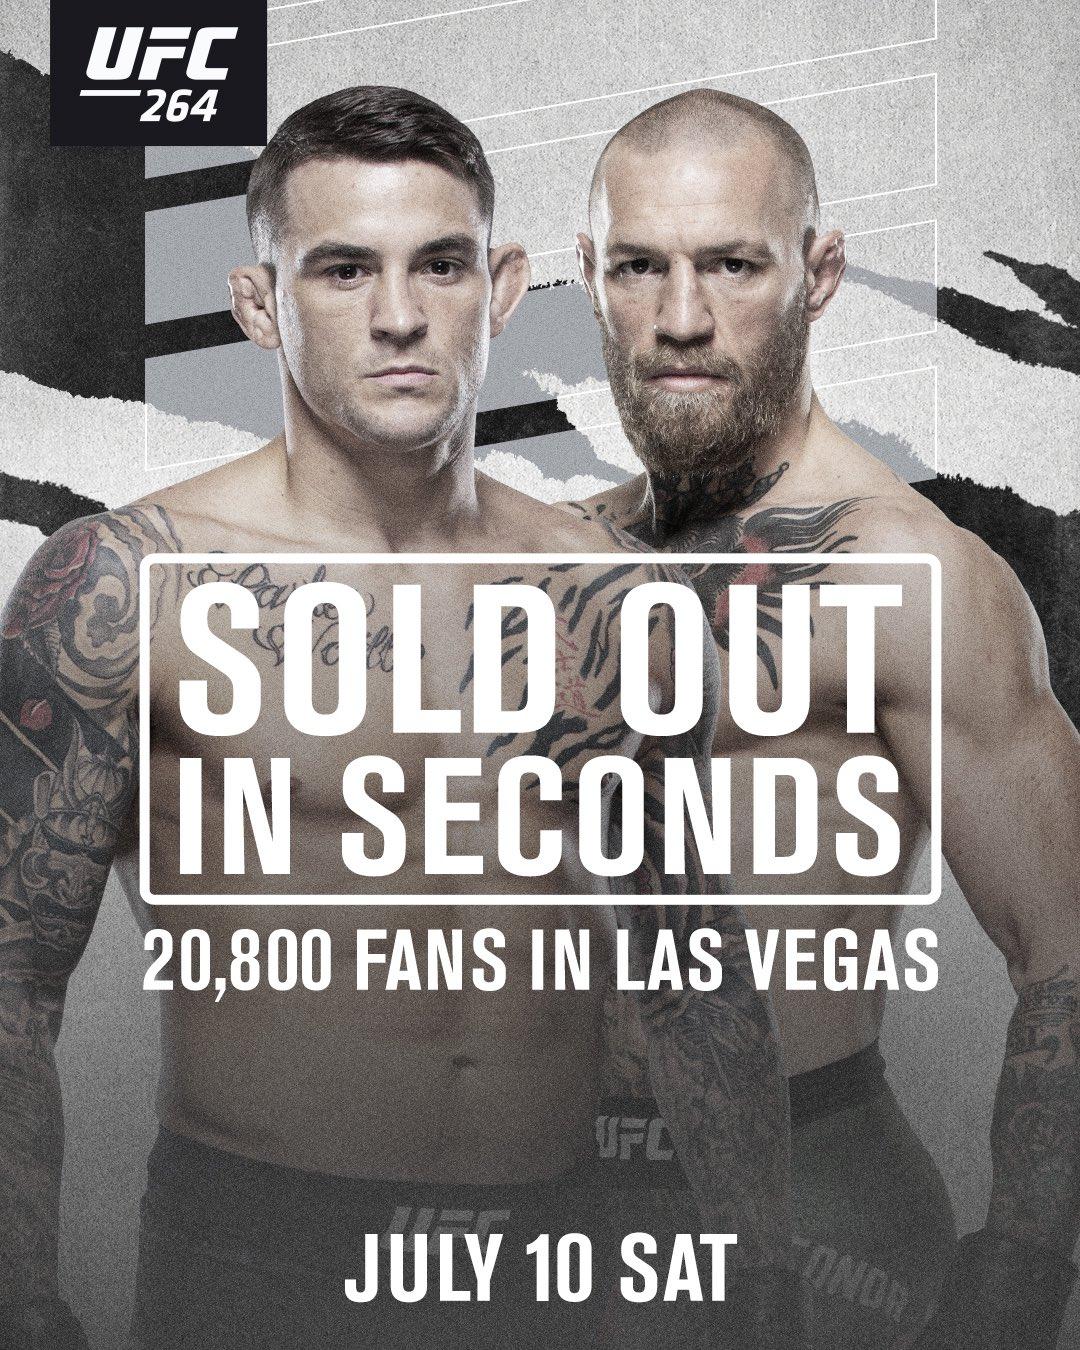 McGregor vs Poirier berjanji akan menjadi pertandingan MMA terbesar sejak wabah Covid-19.